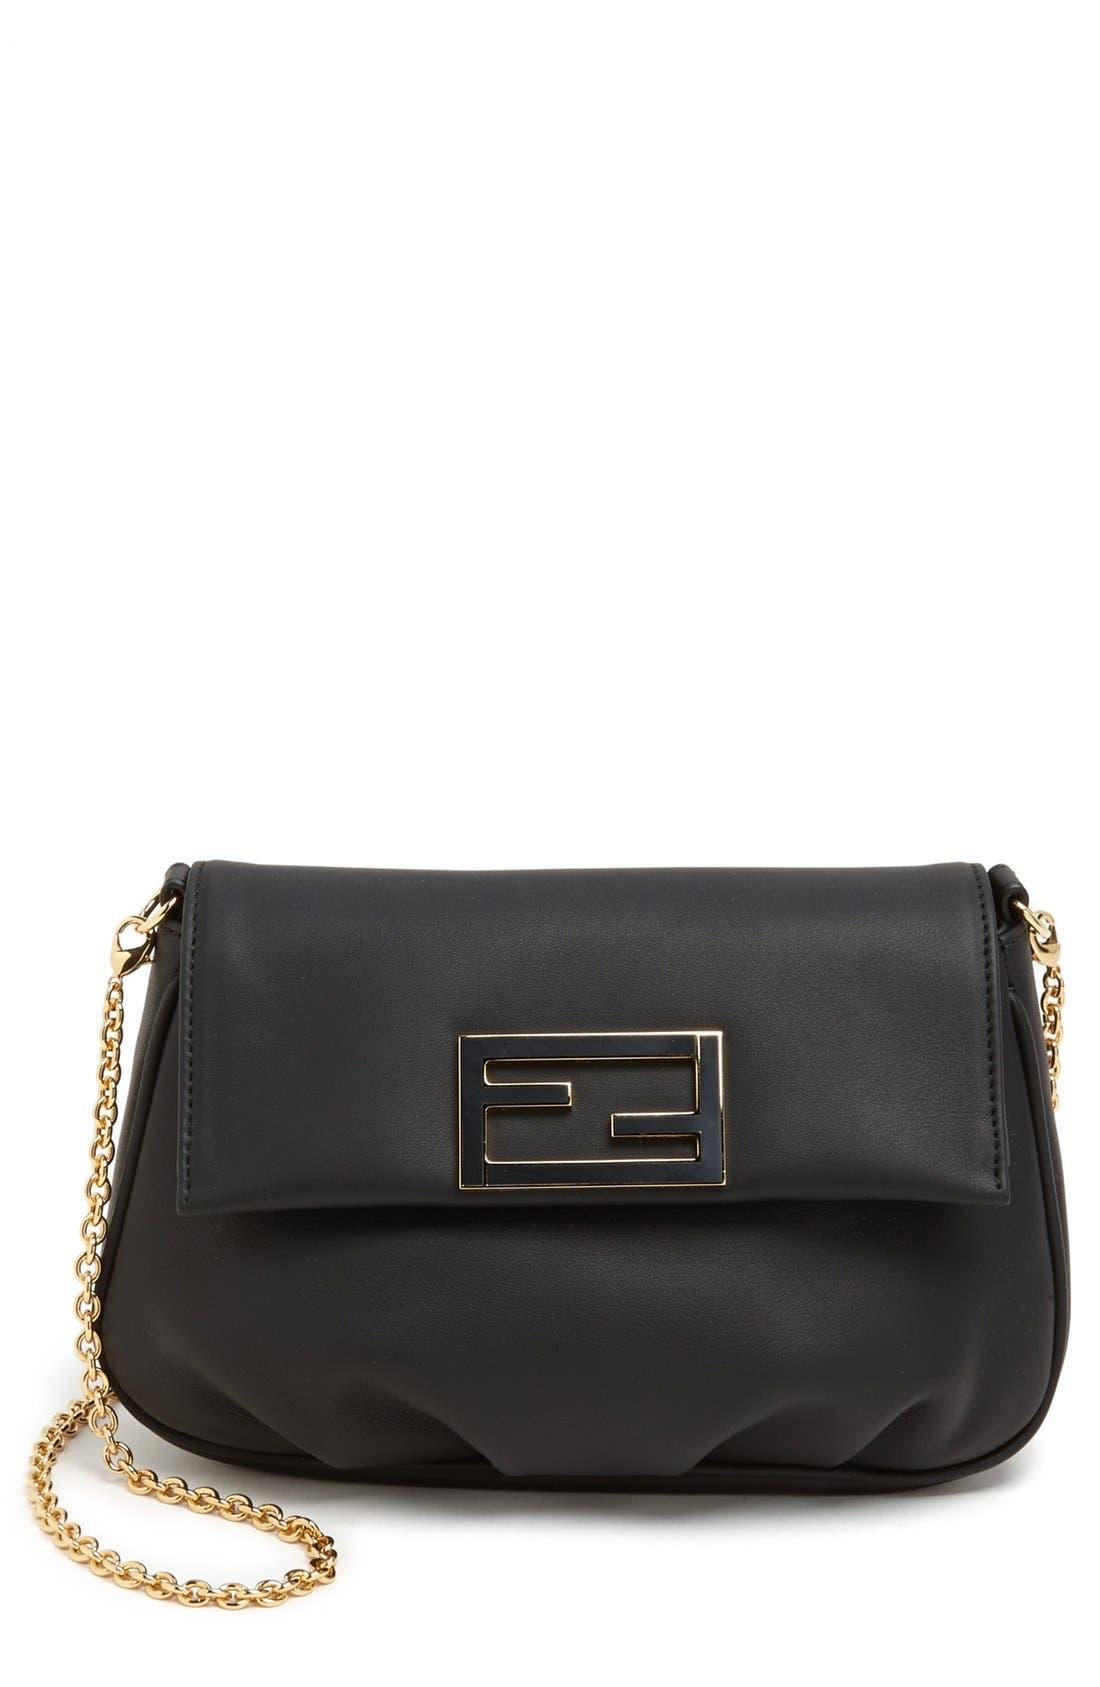 Alternate Image 1 Selected - Fendi 'Fendista' Pouchette Crossbody Bag